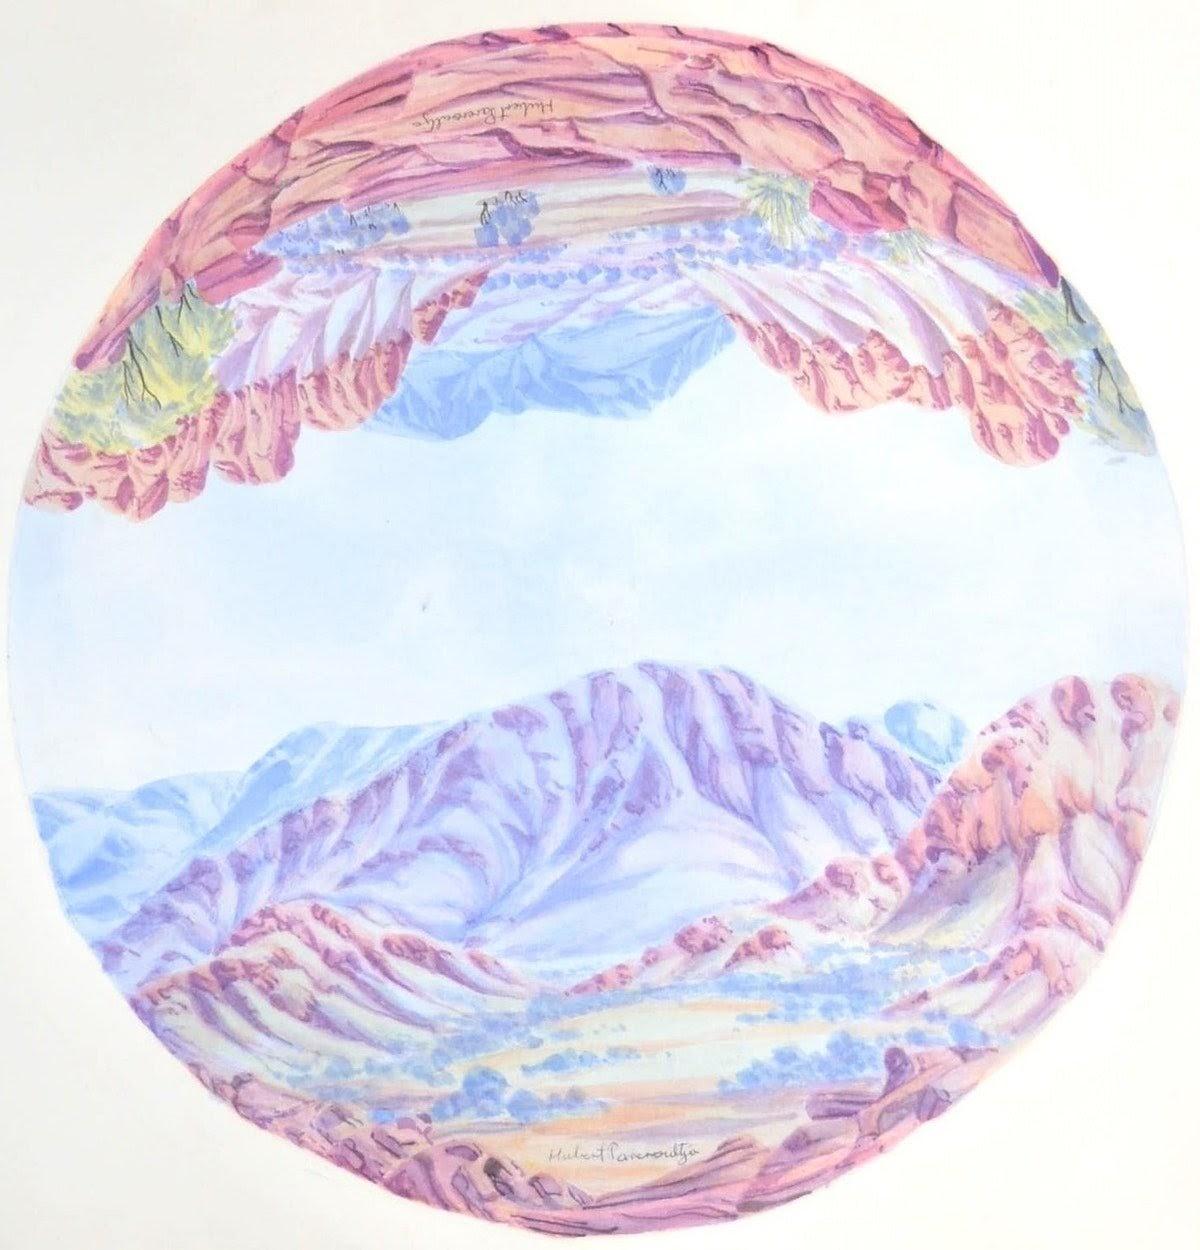 hubert pareroultja mt giles macdonnell ranges circular landscape